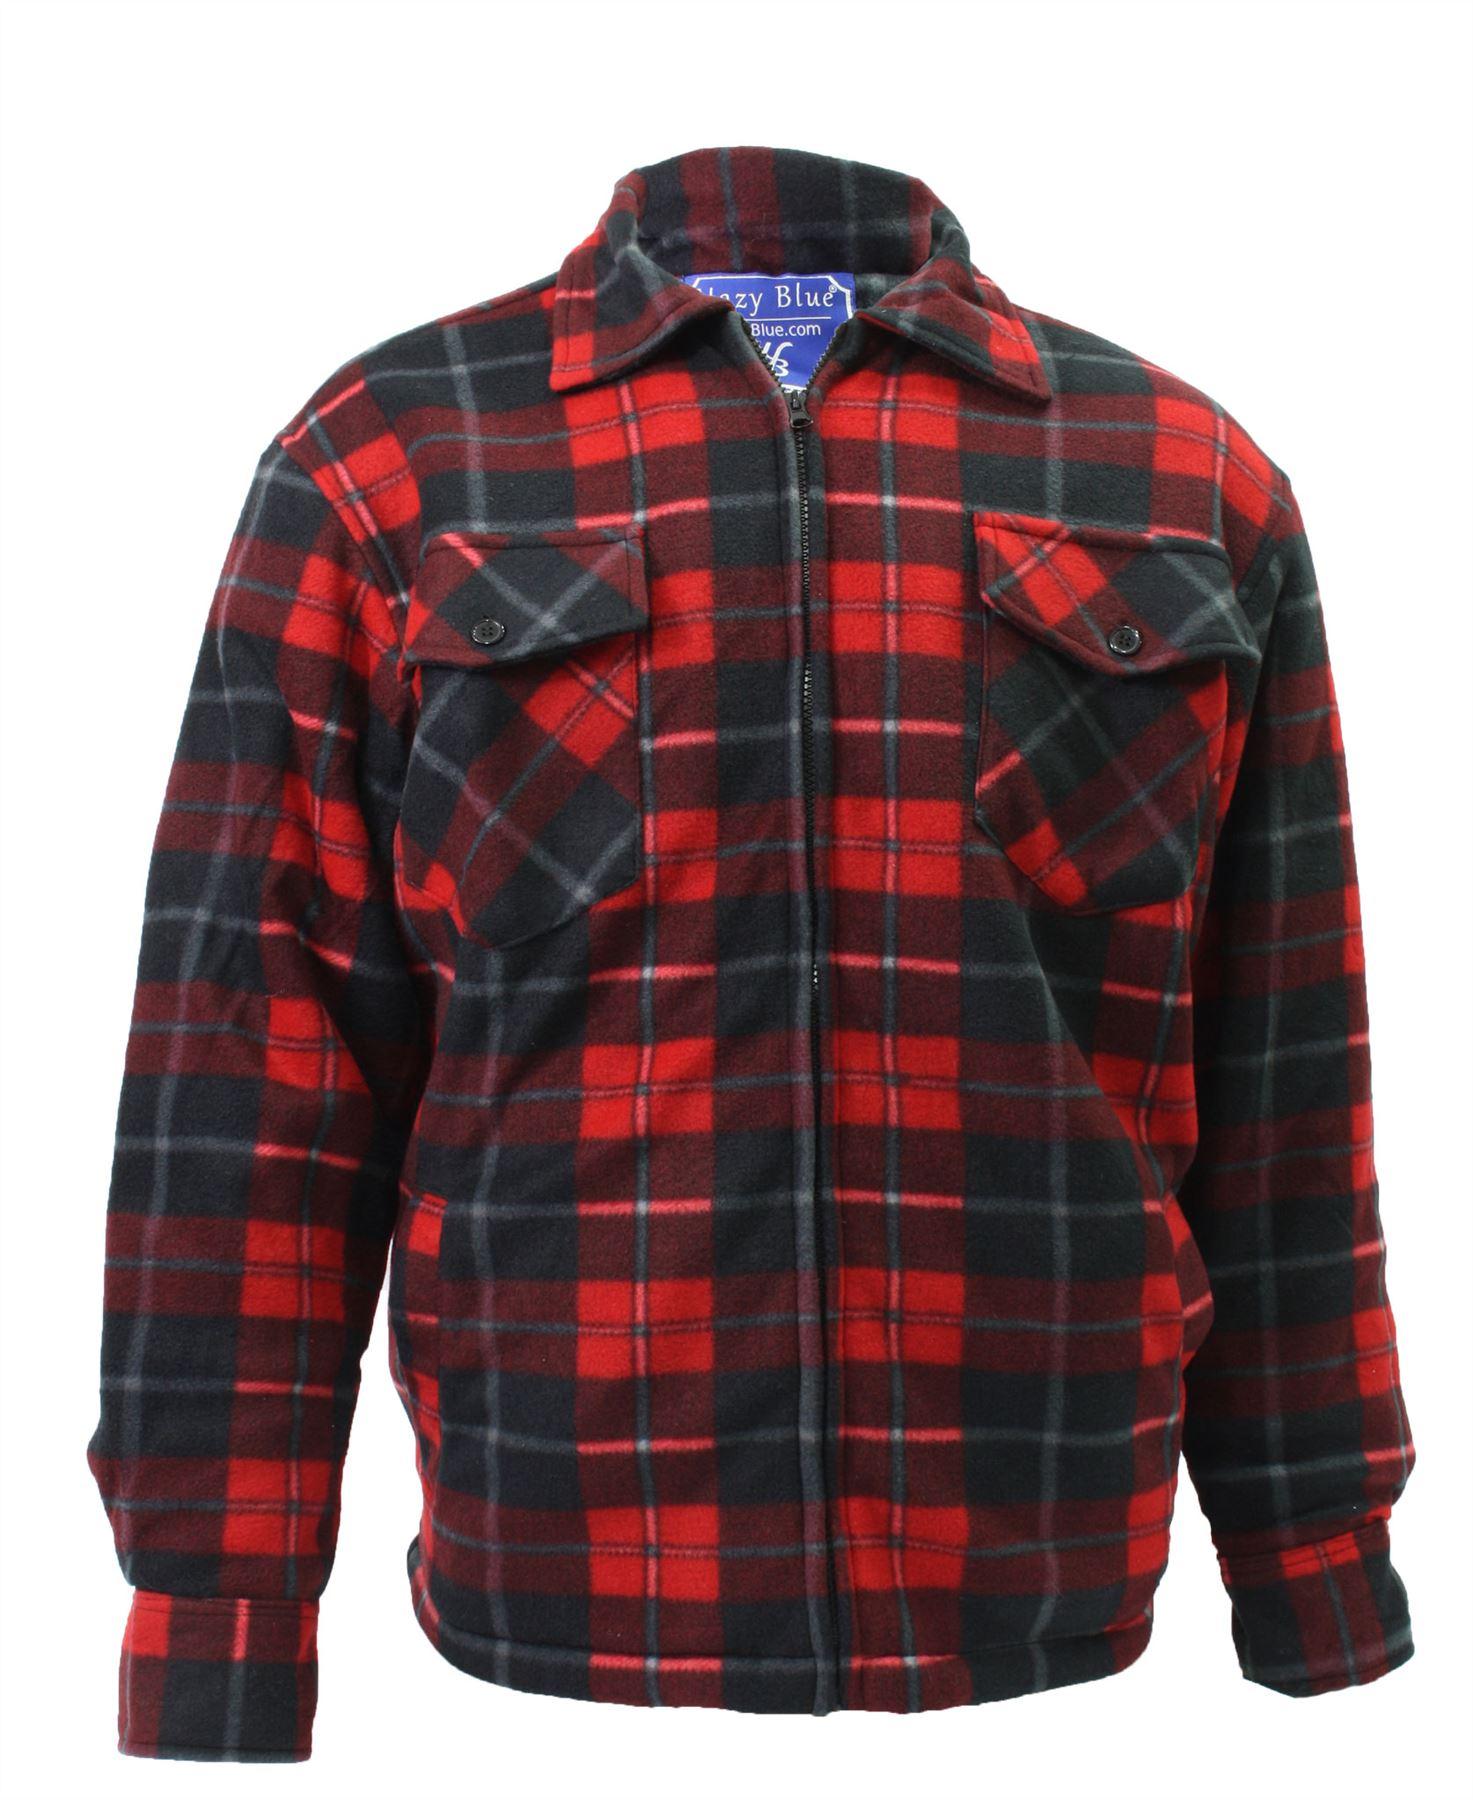 Sean John Red And Black Lumberjack Jacket